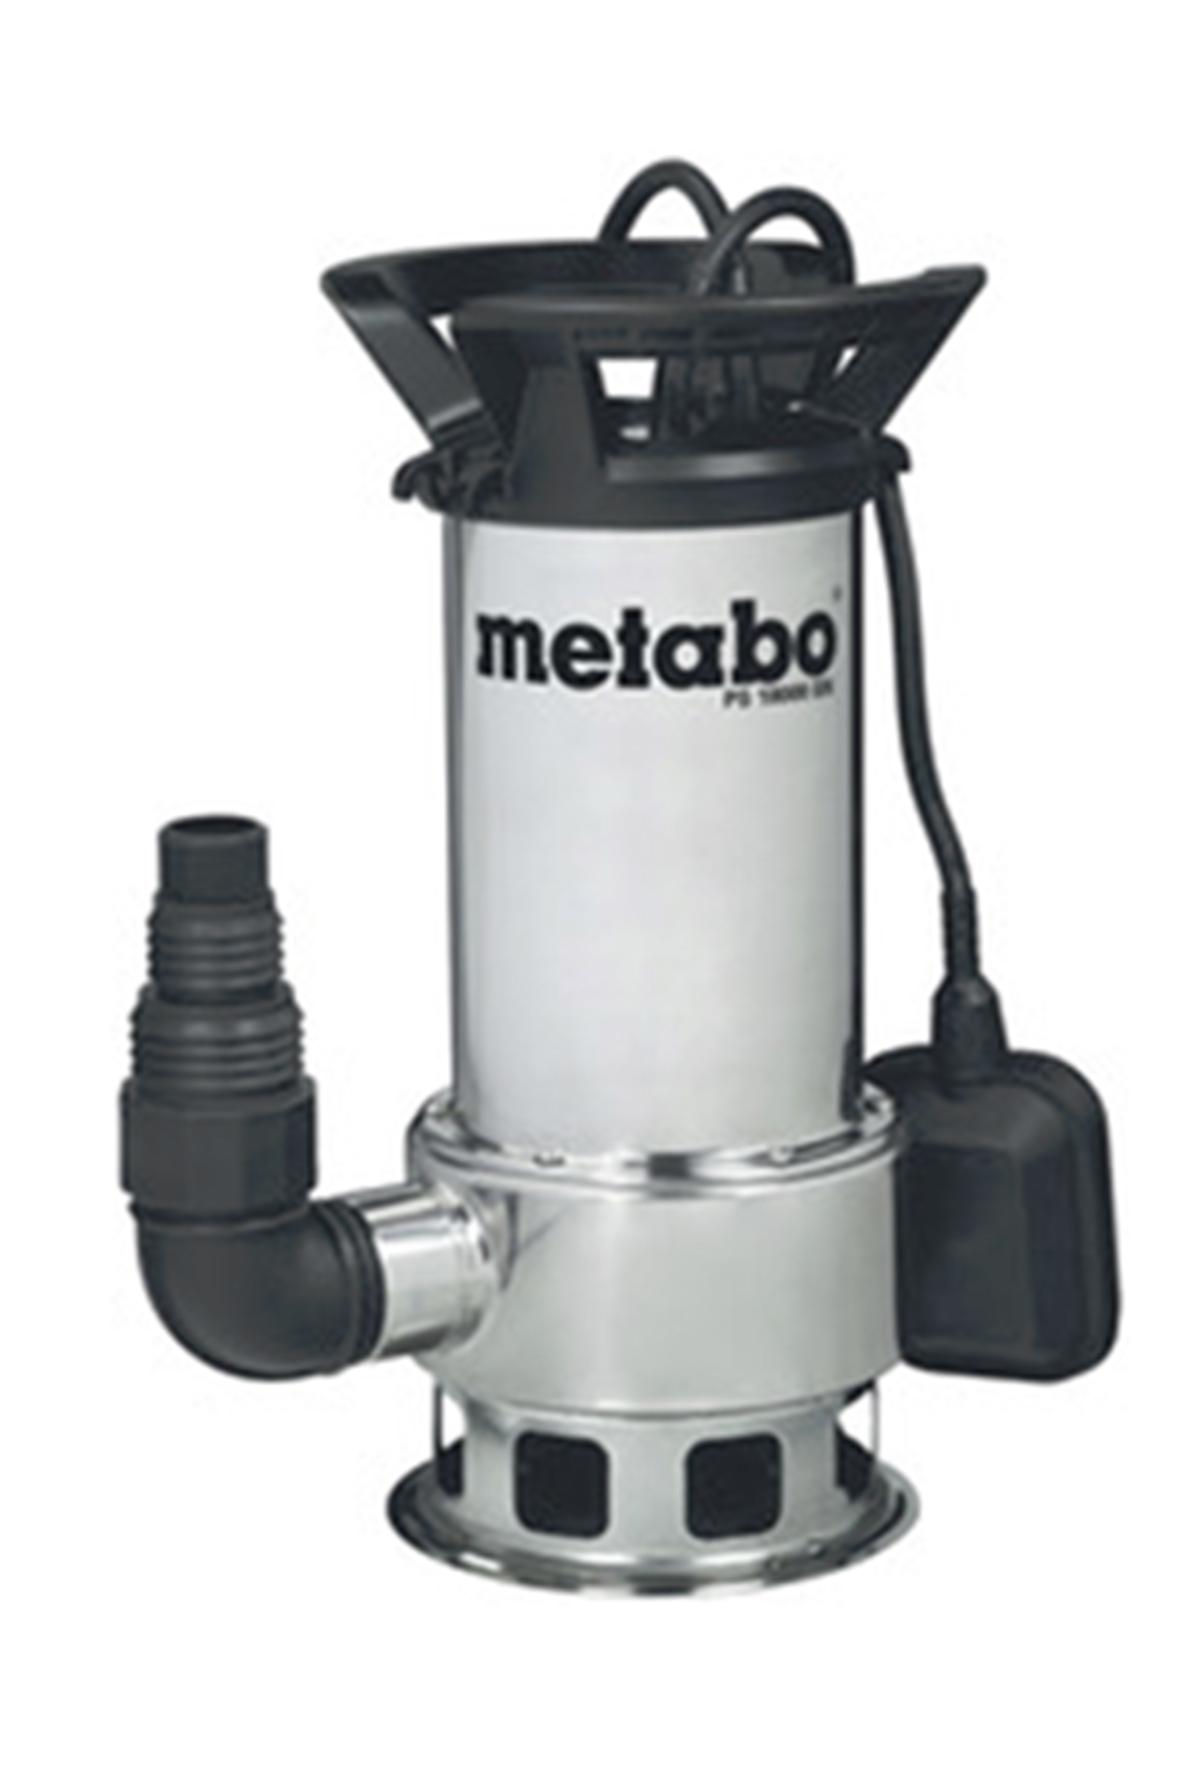 Pompe vidange metabo ps 18000 sn achat en ligne ou dans for Pompe eau jardin